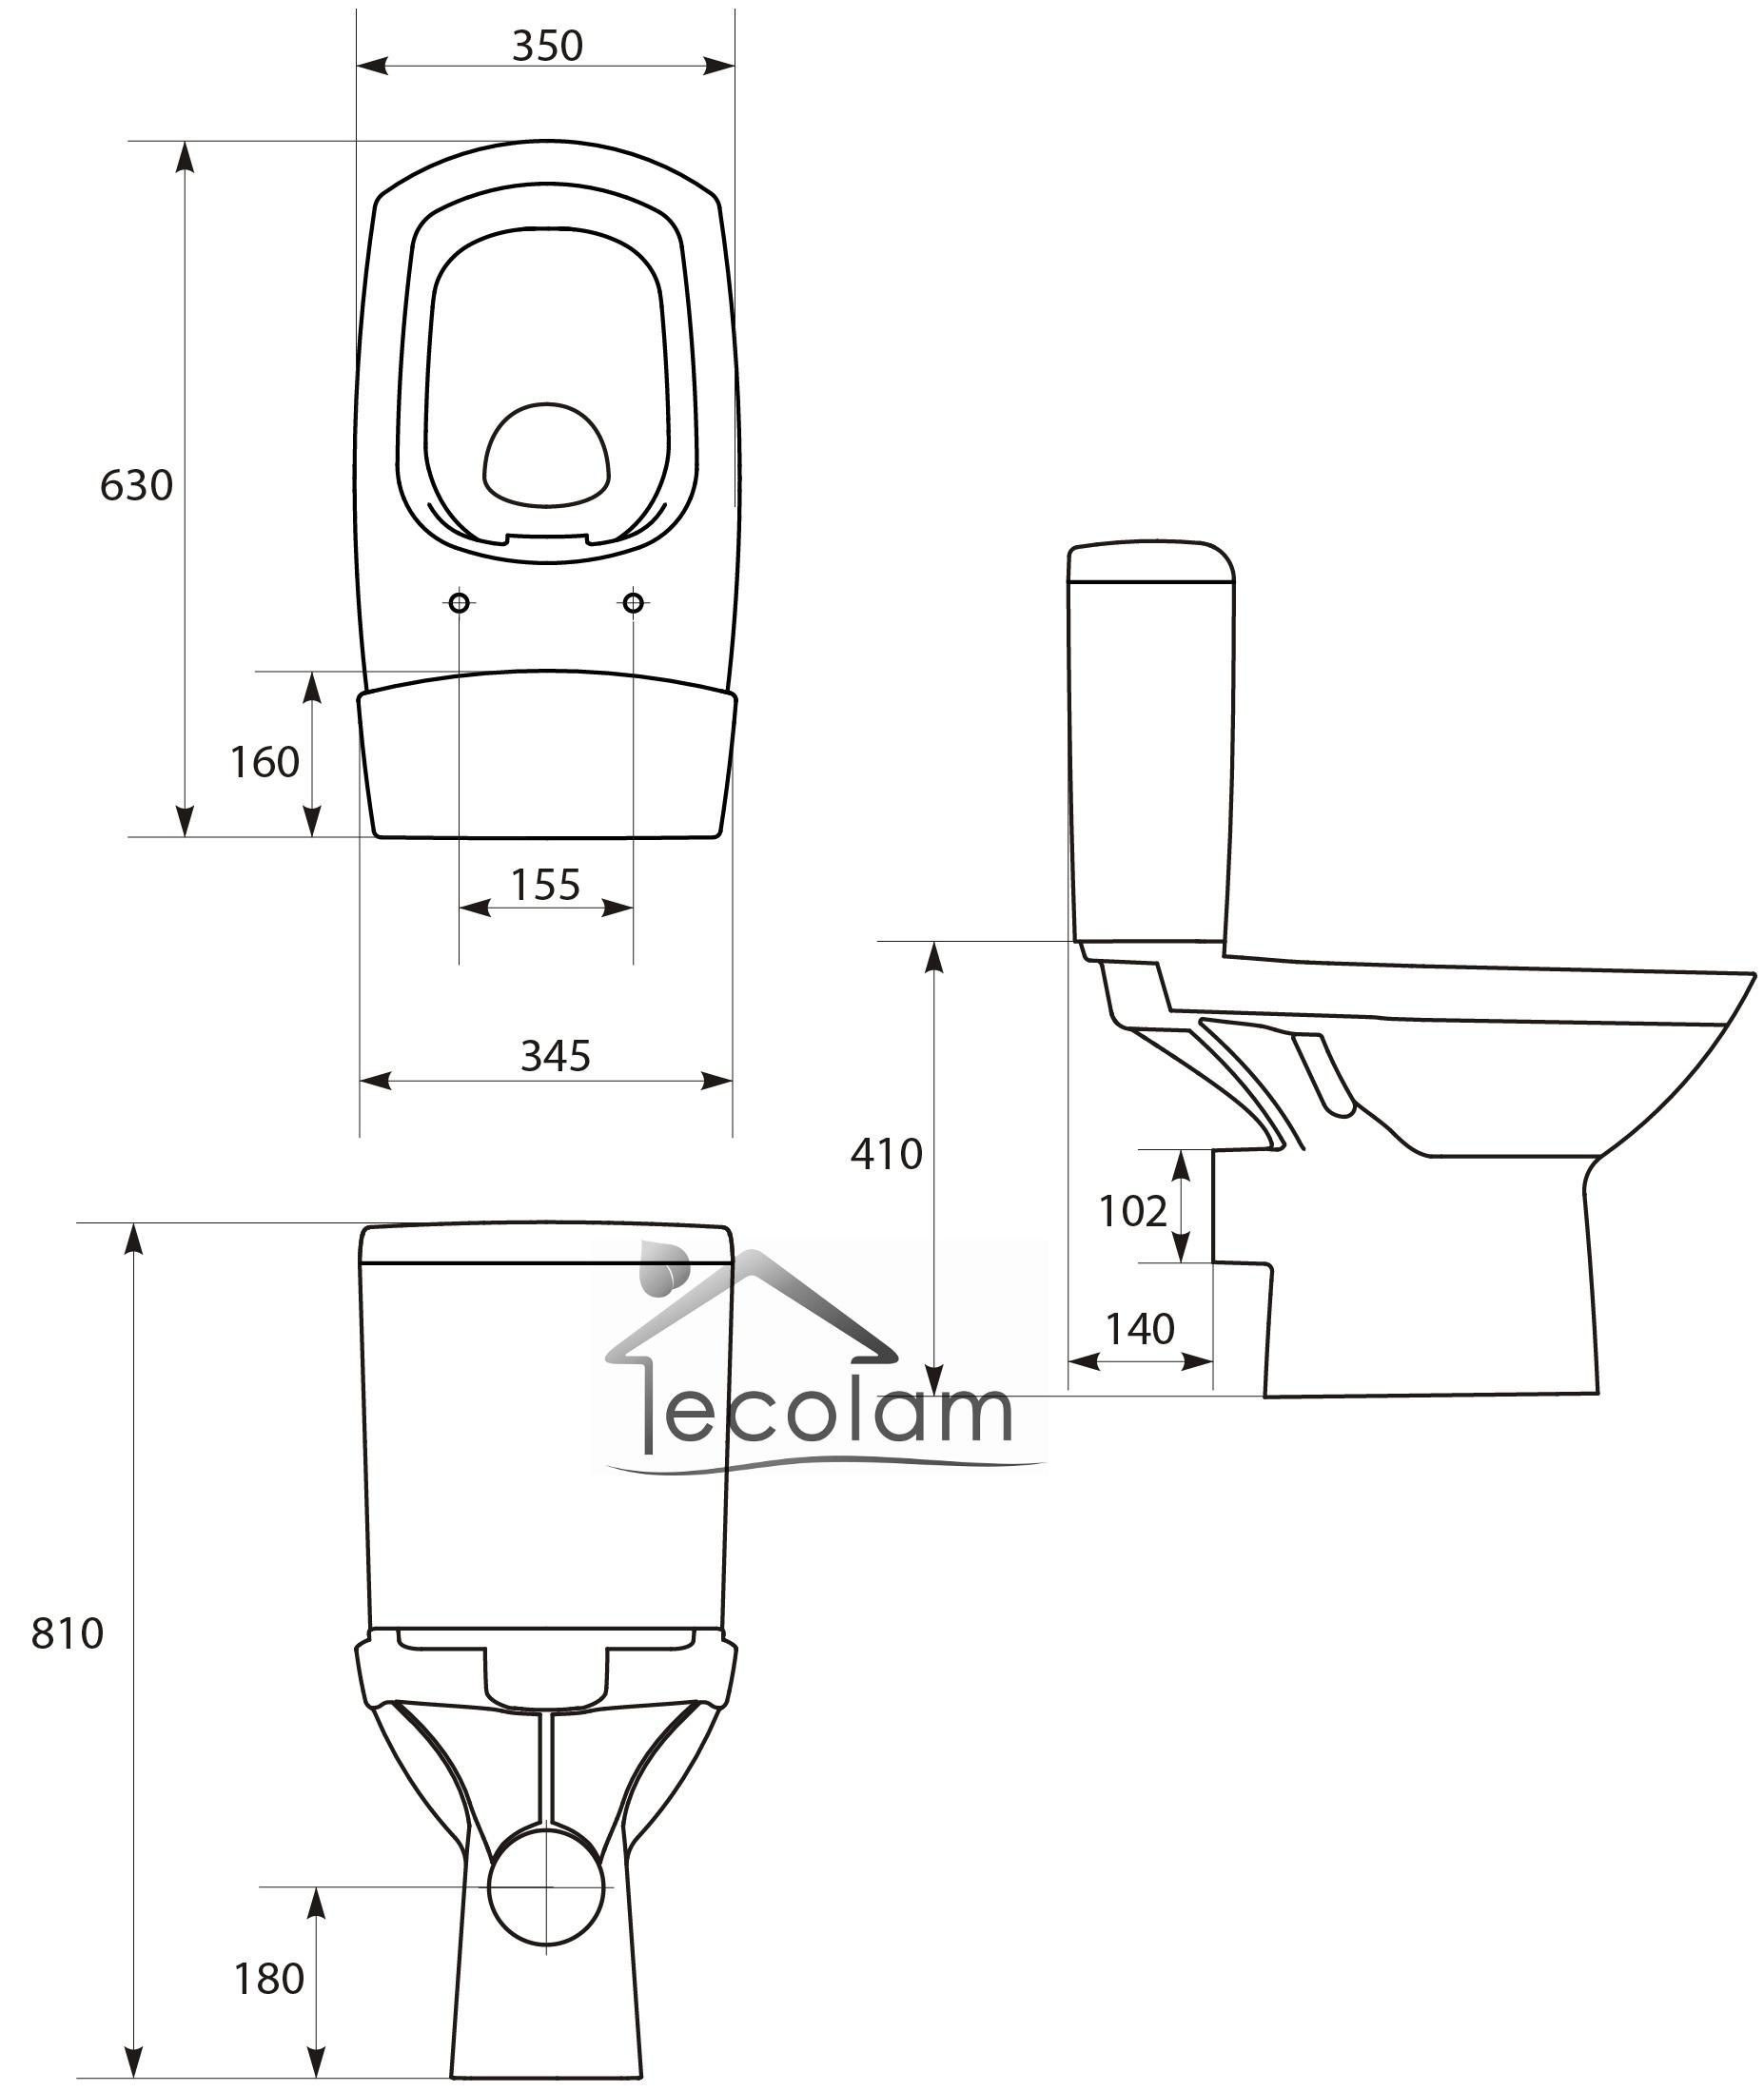 Höhe Wc wc toilette stand tiefspüler spülkasten clean on spülrandlos sitz